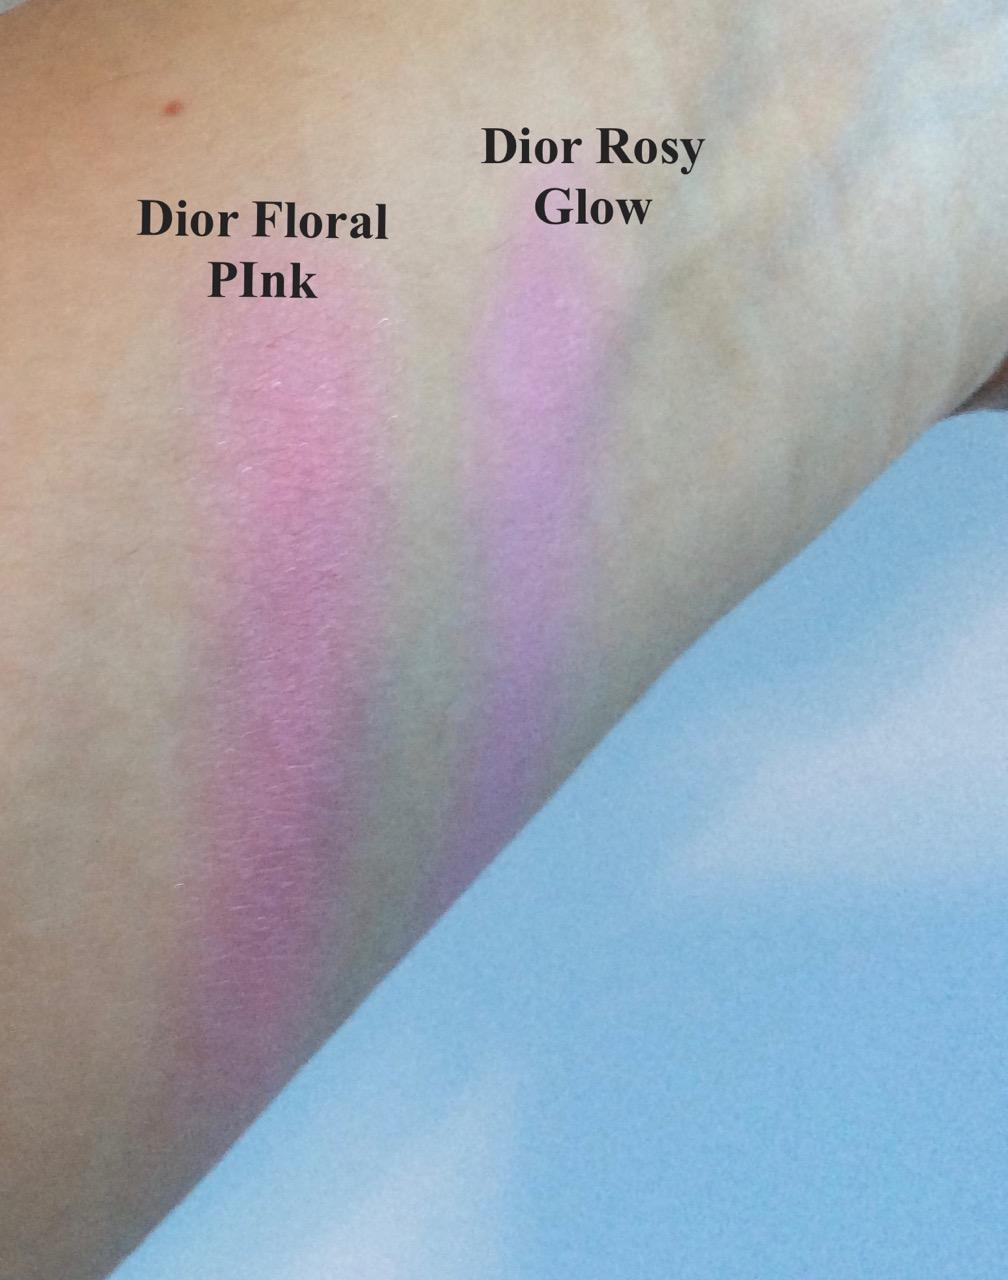 DiorSkin Rosy Glow by Dior #14